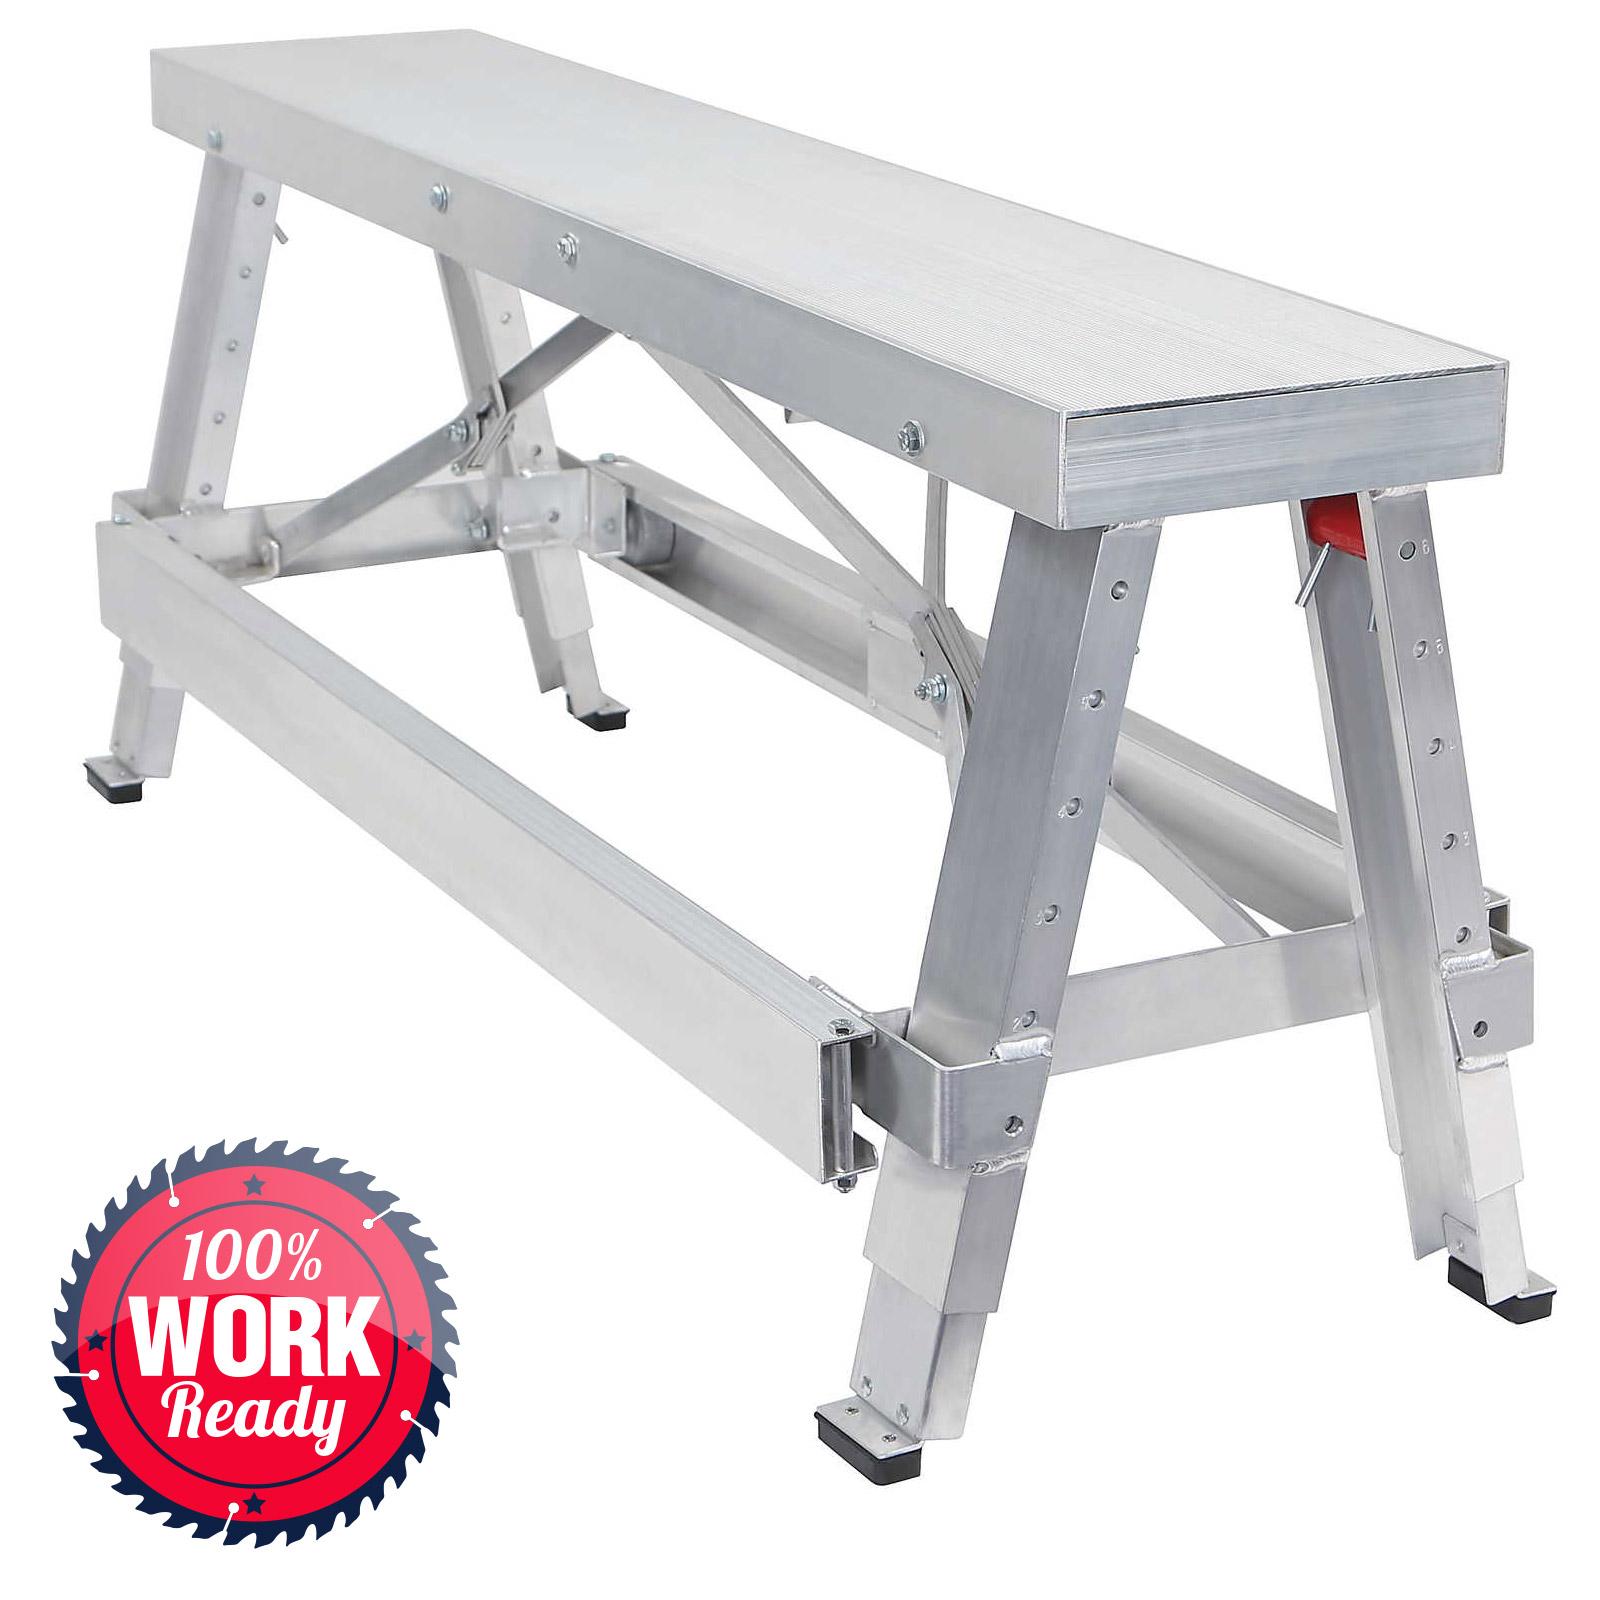 Drywall Bench Sawhorse Step Ladder Adjustable Height